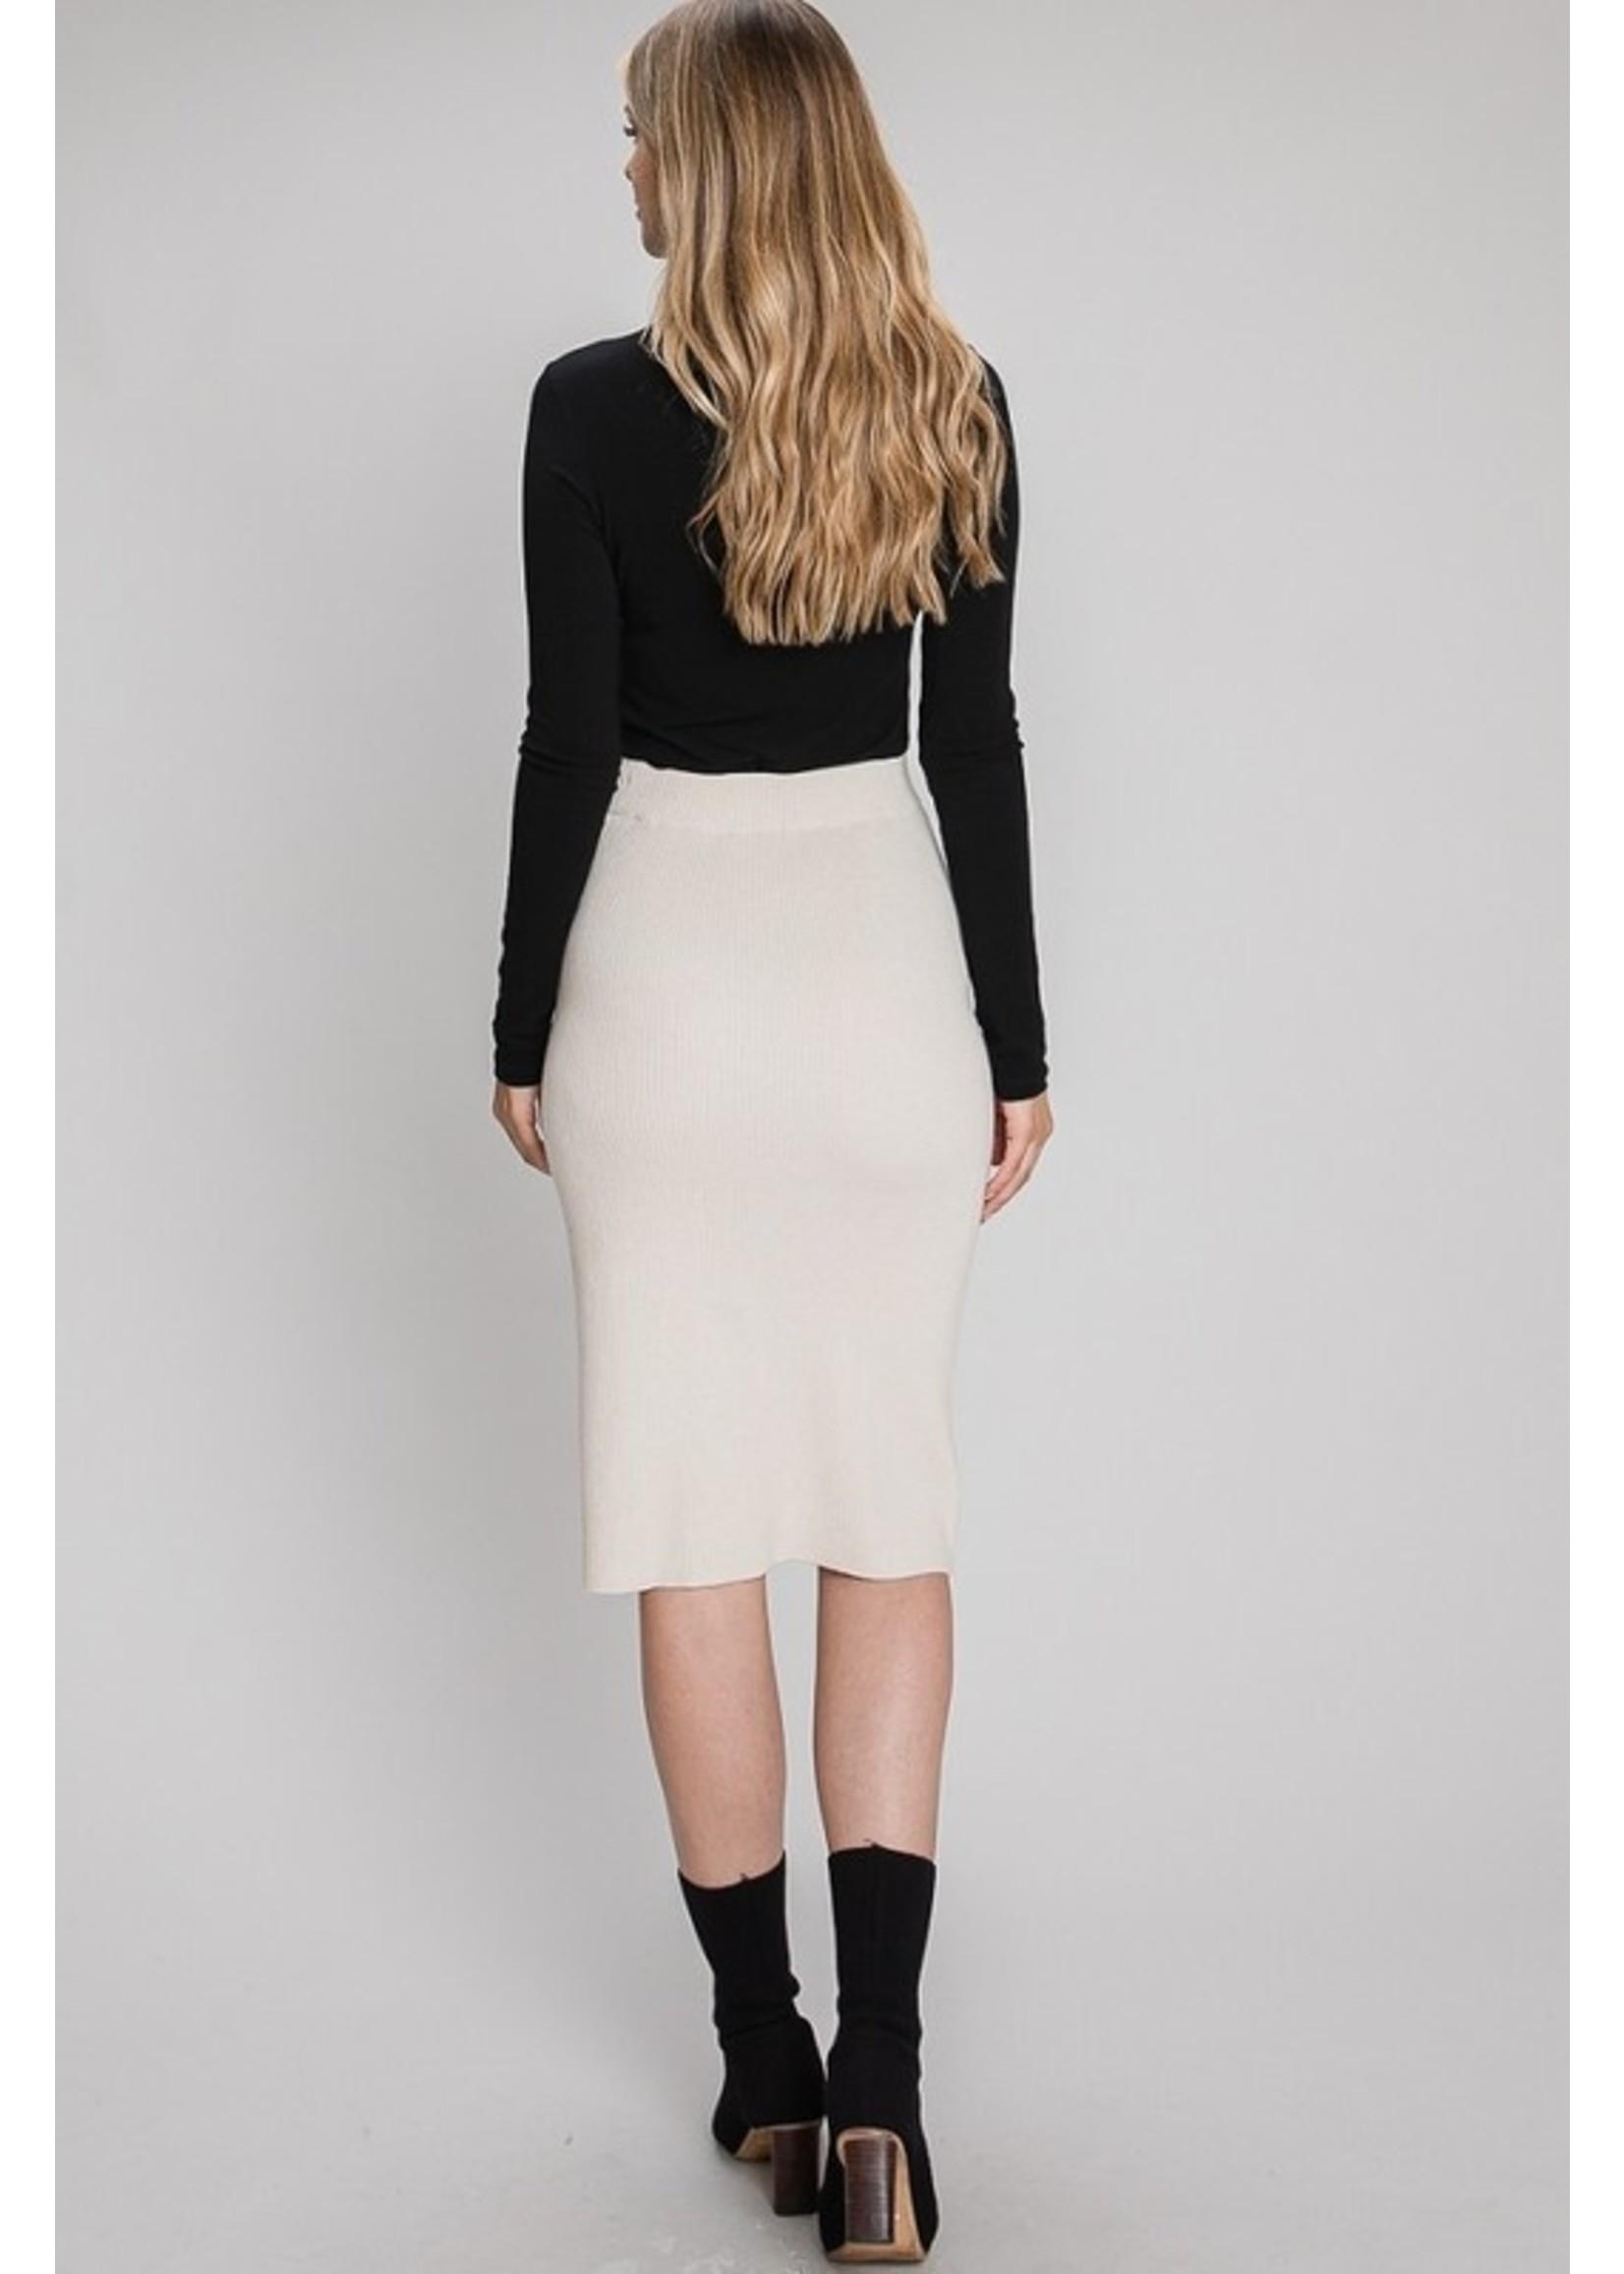 Allie Rose Downtown Girl Pencil Skirt Cream